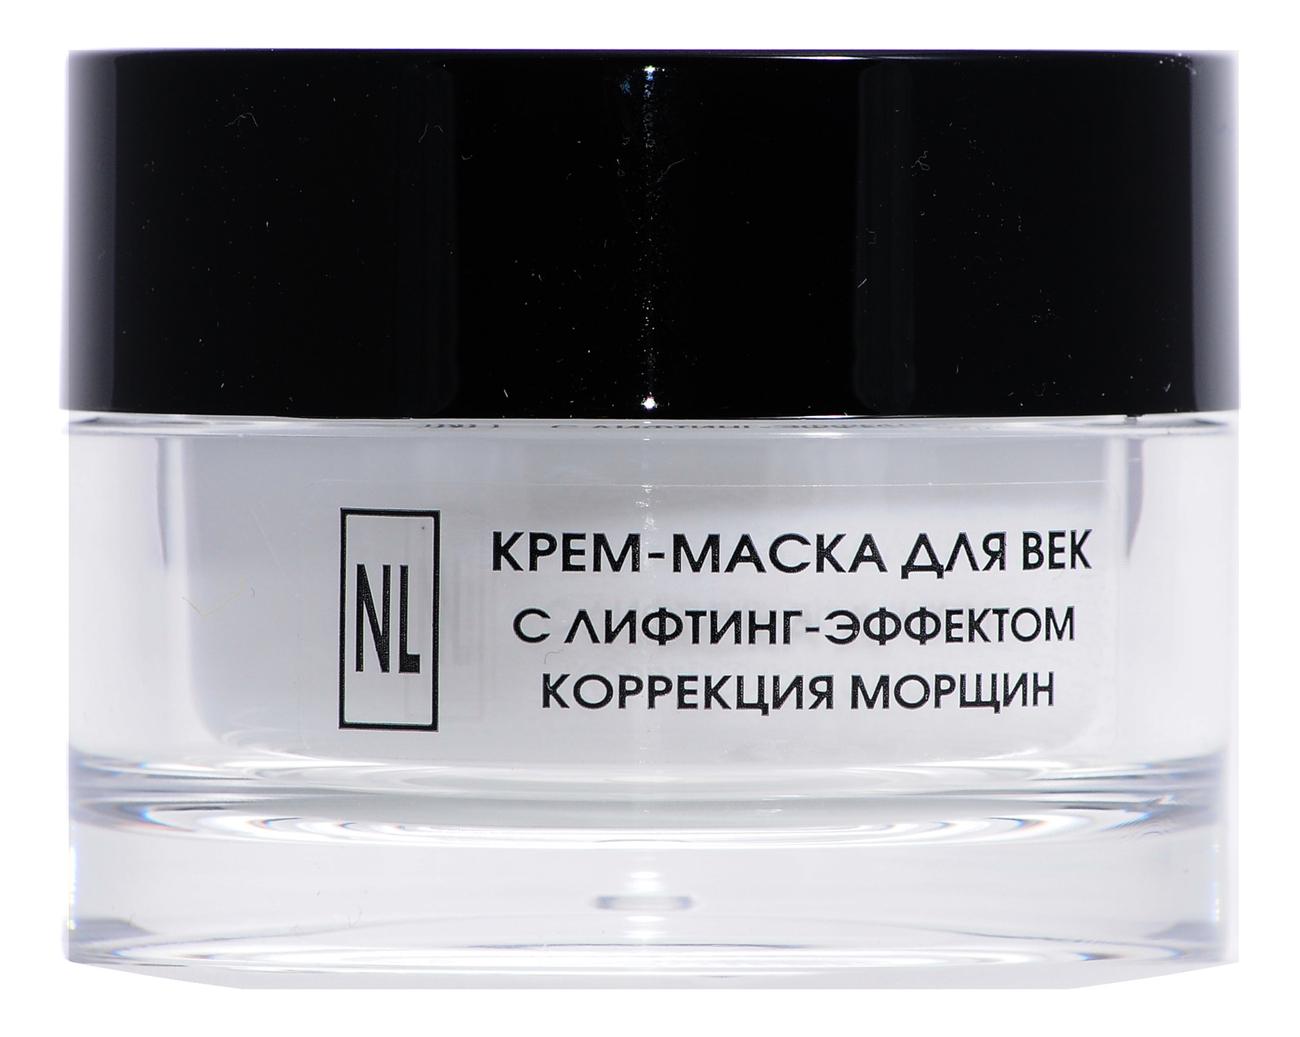 Крем-маска для век с лифтинг-эффектом Eye Cream-Mask With Lifting Effect Correction Of Wrinkles 50мл фото